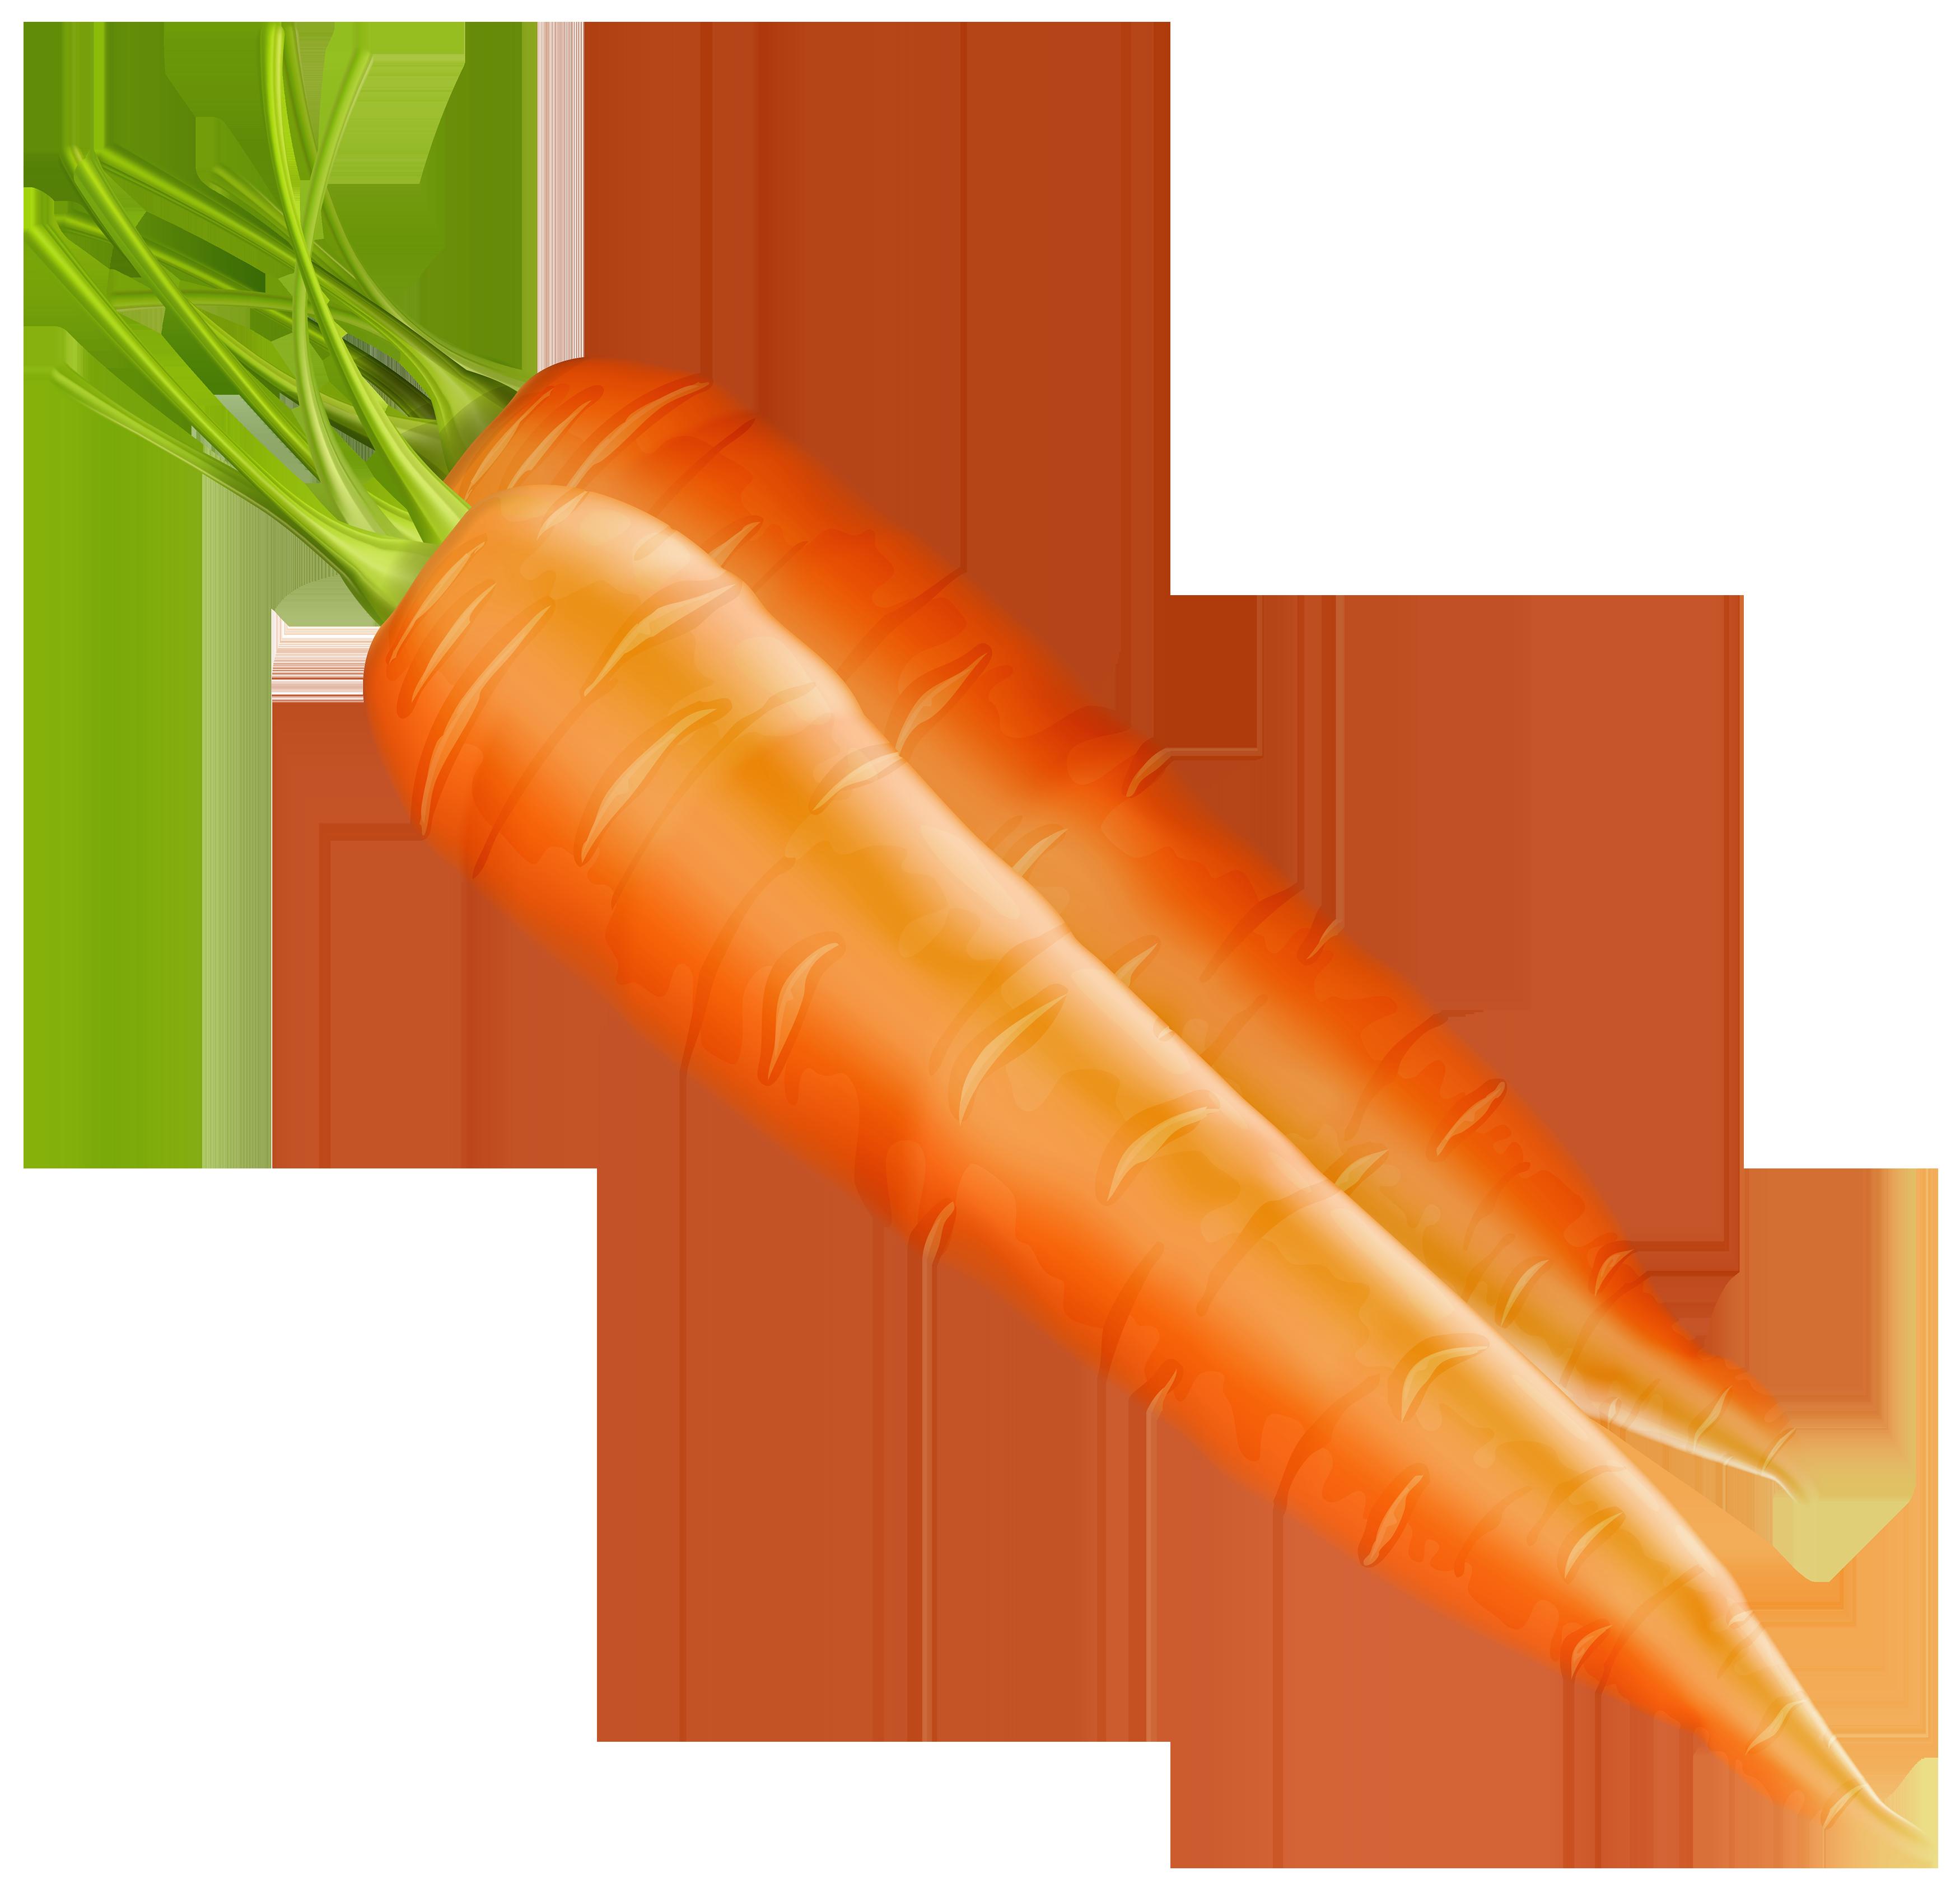 Clipart vegetables carrot. Carrots png best web